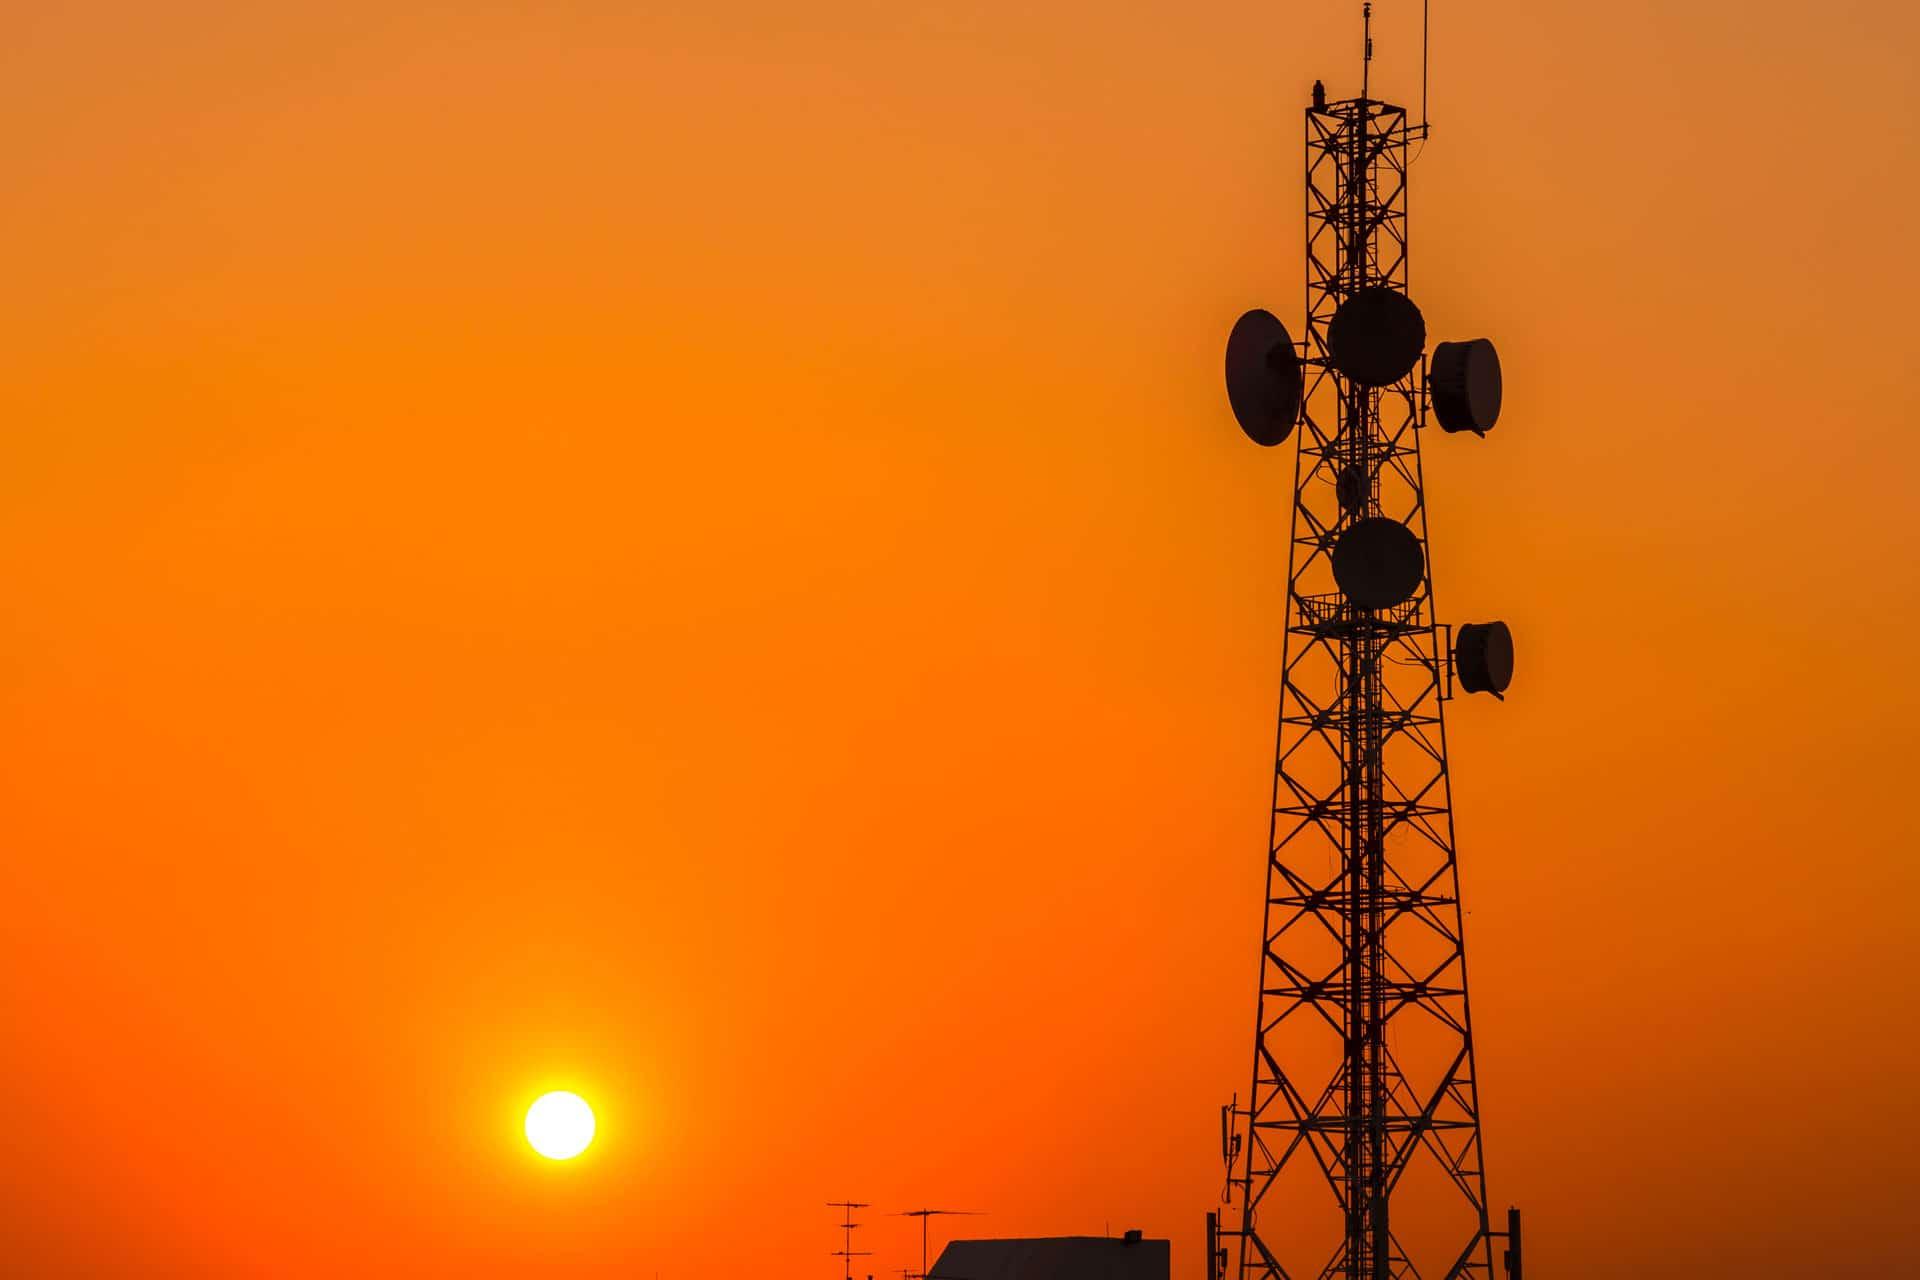 Pangea IoT blog: 2G tower with sunset